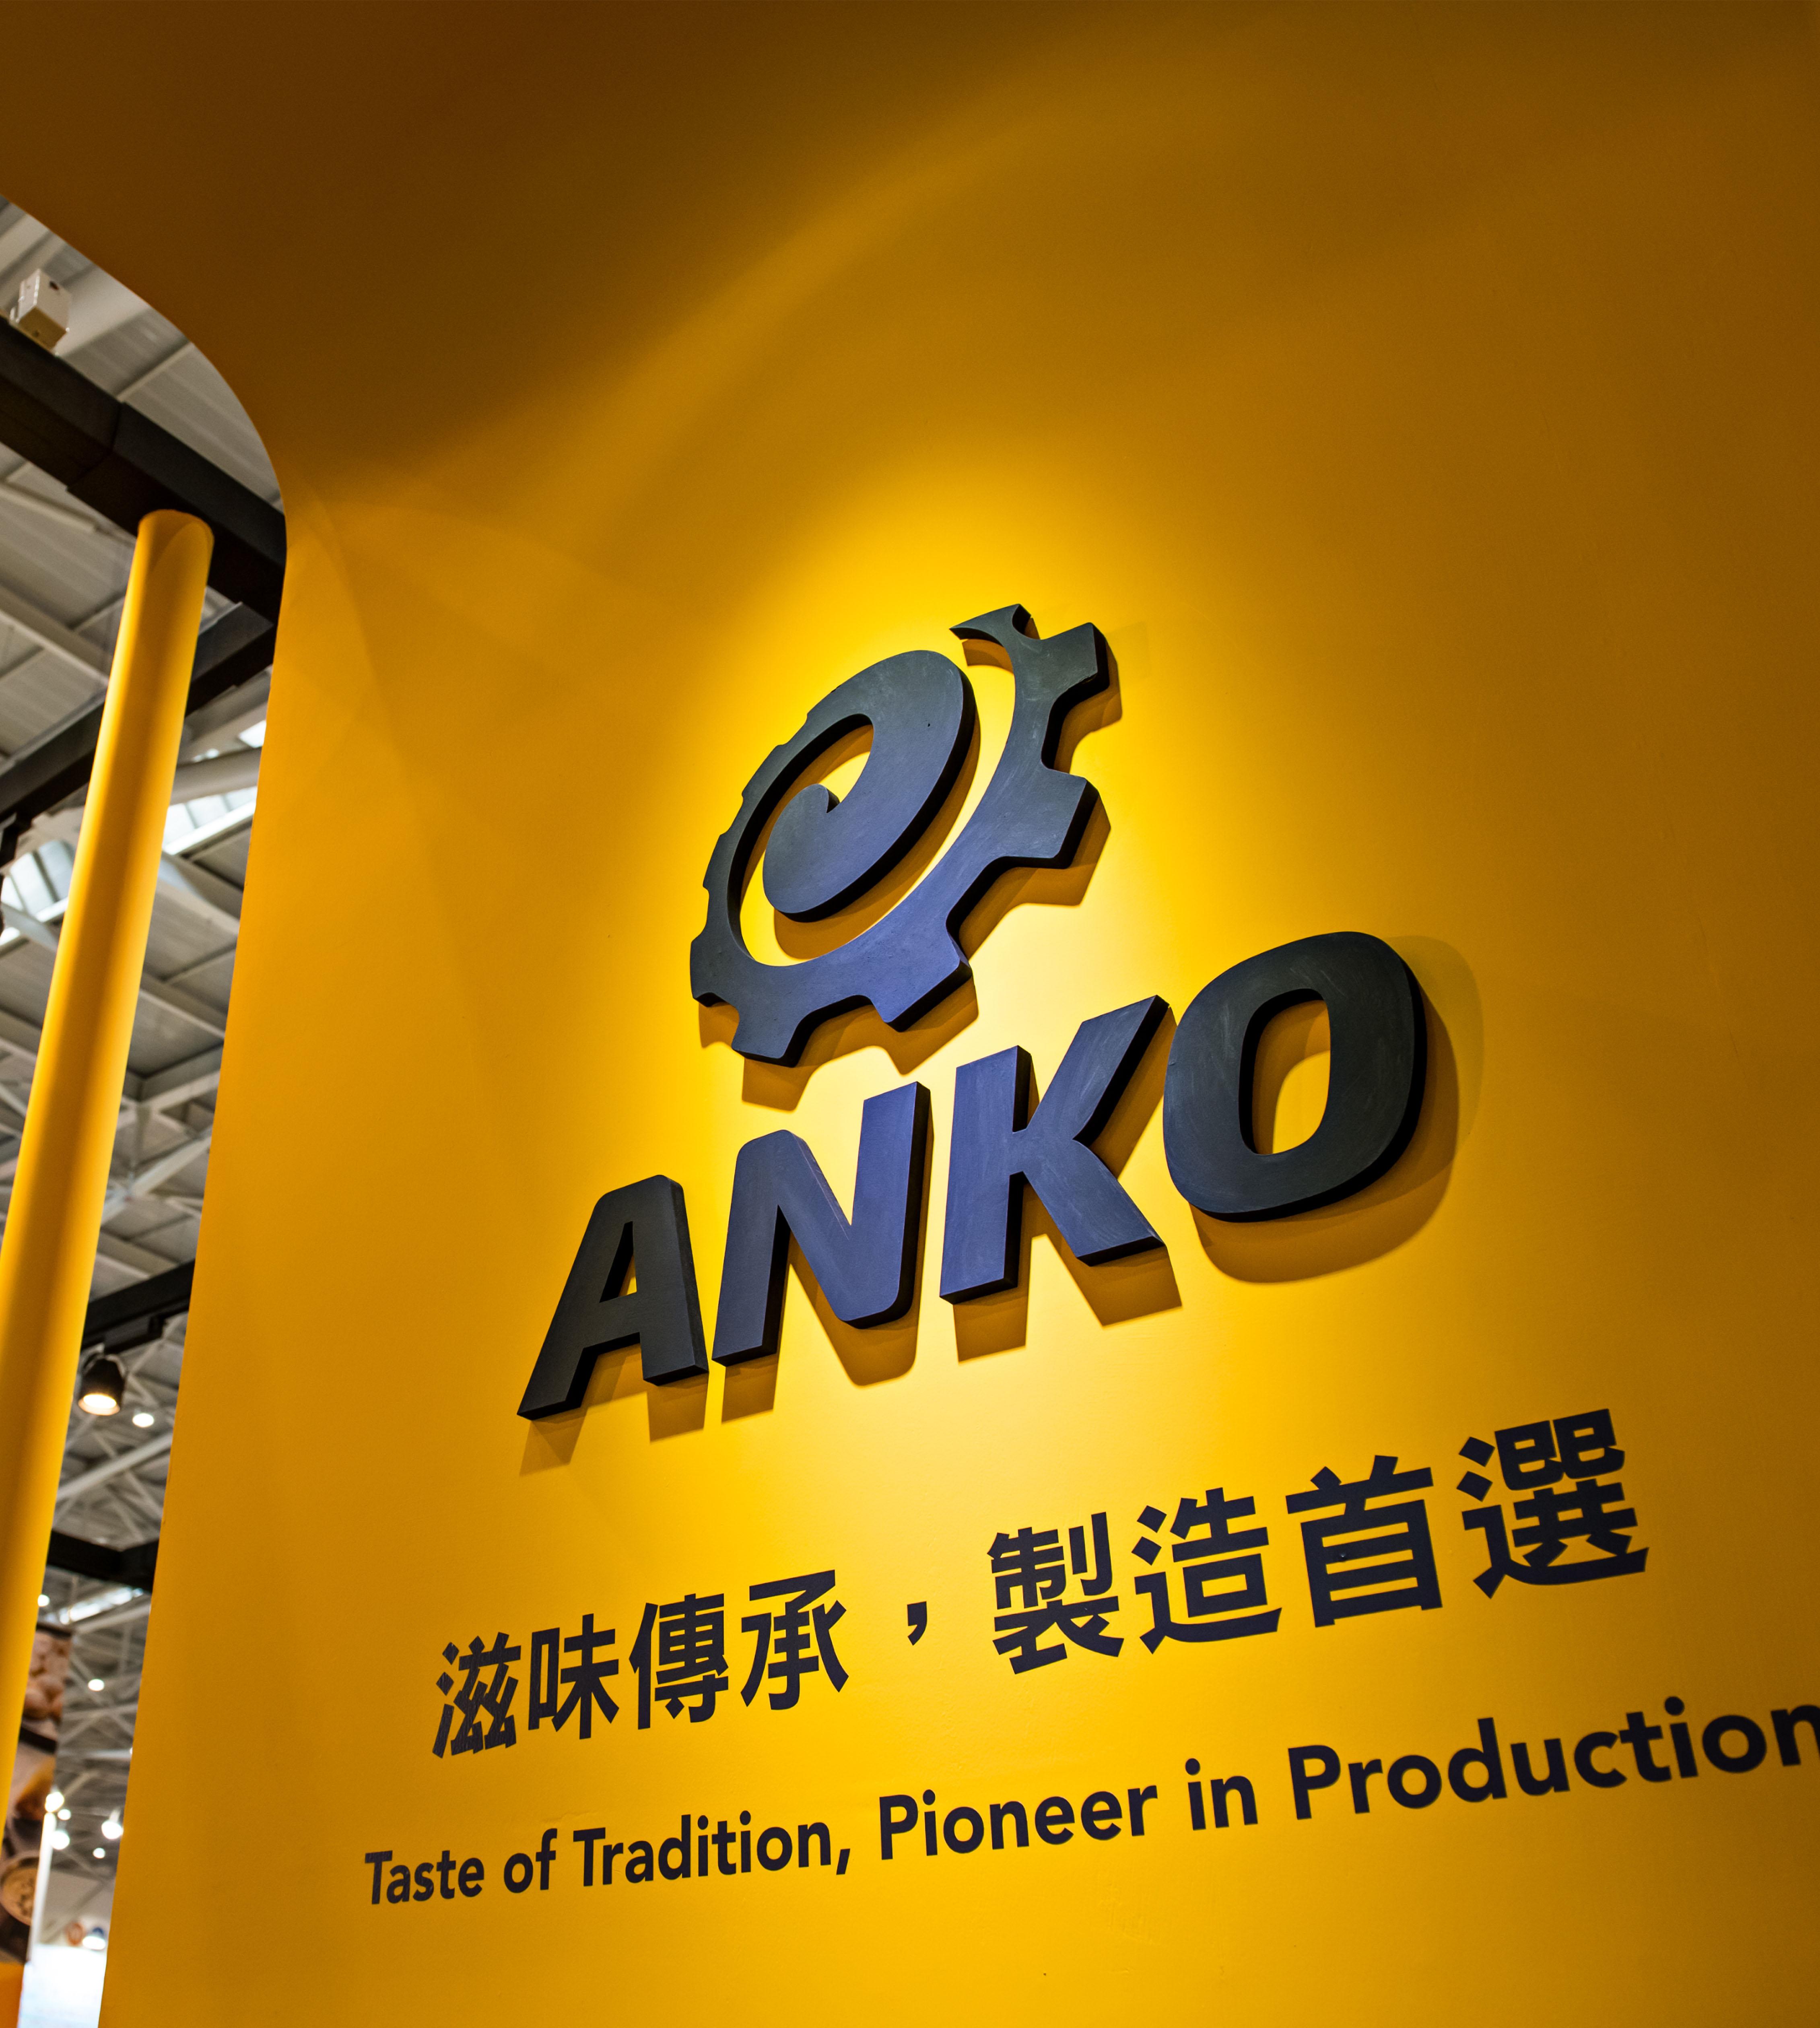 ANKO 安口食品機械